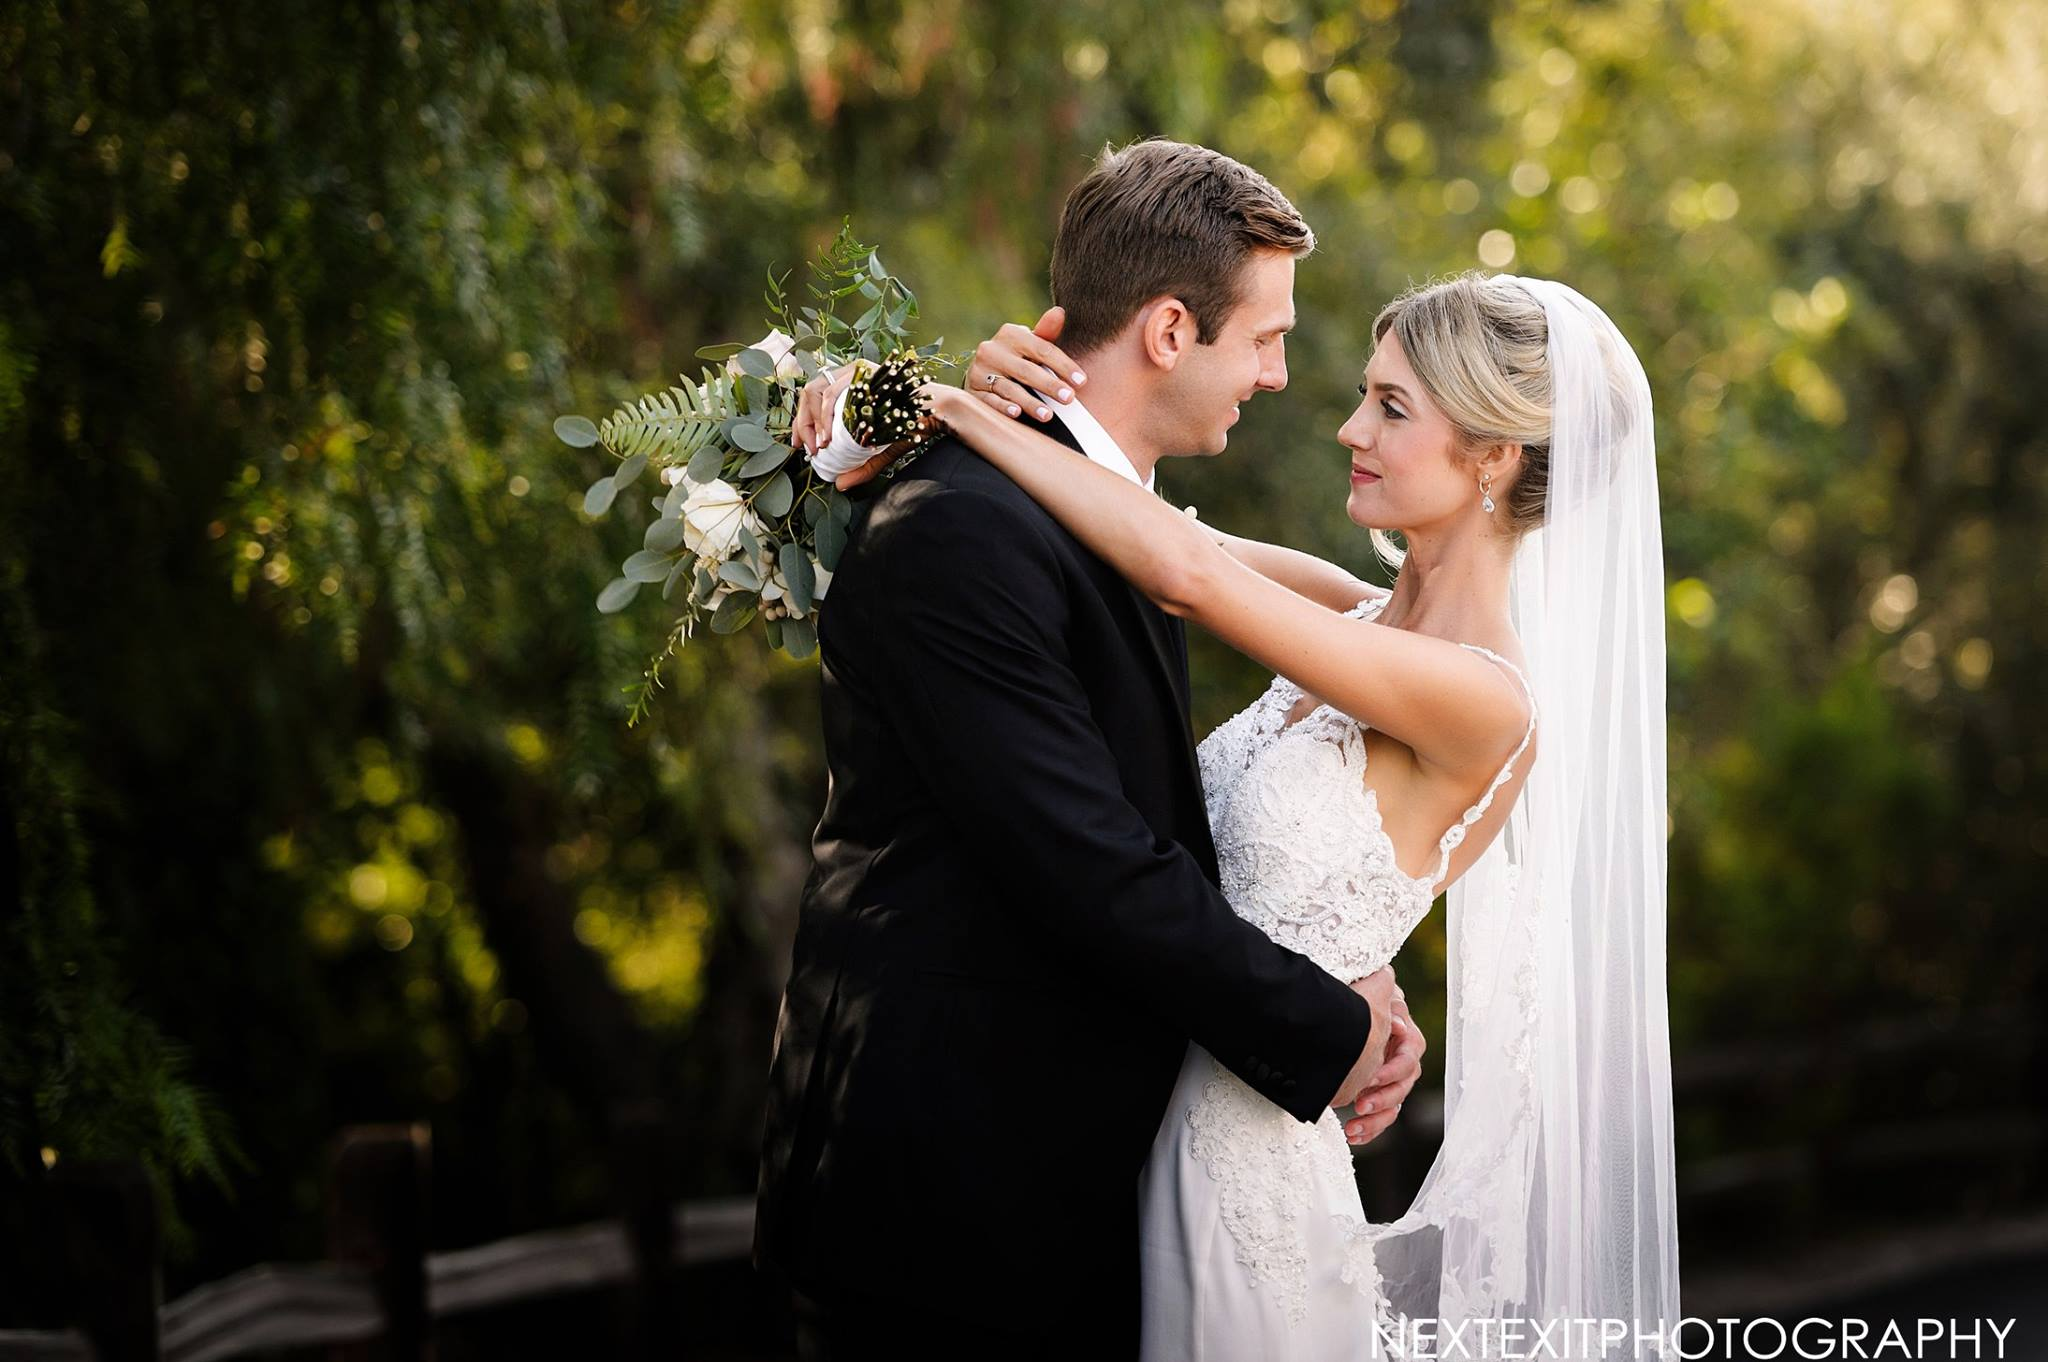 Lotus_And_Lily_Floral_Design_Cielo_Farms_Wedding